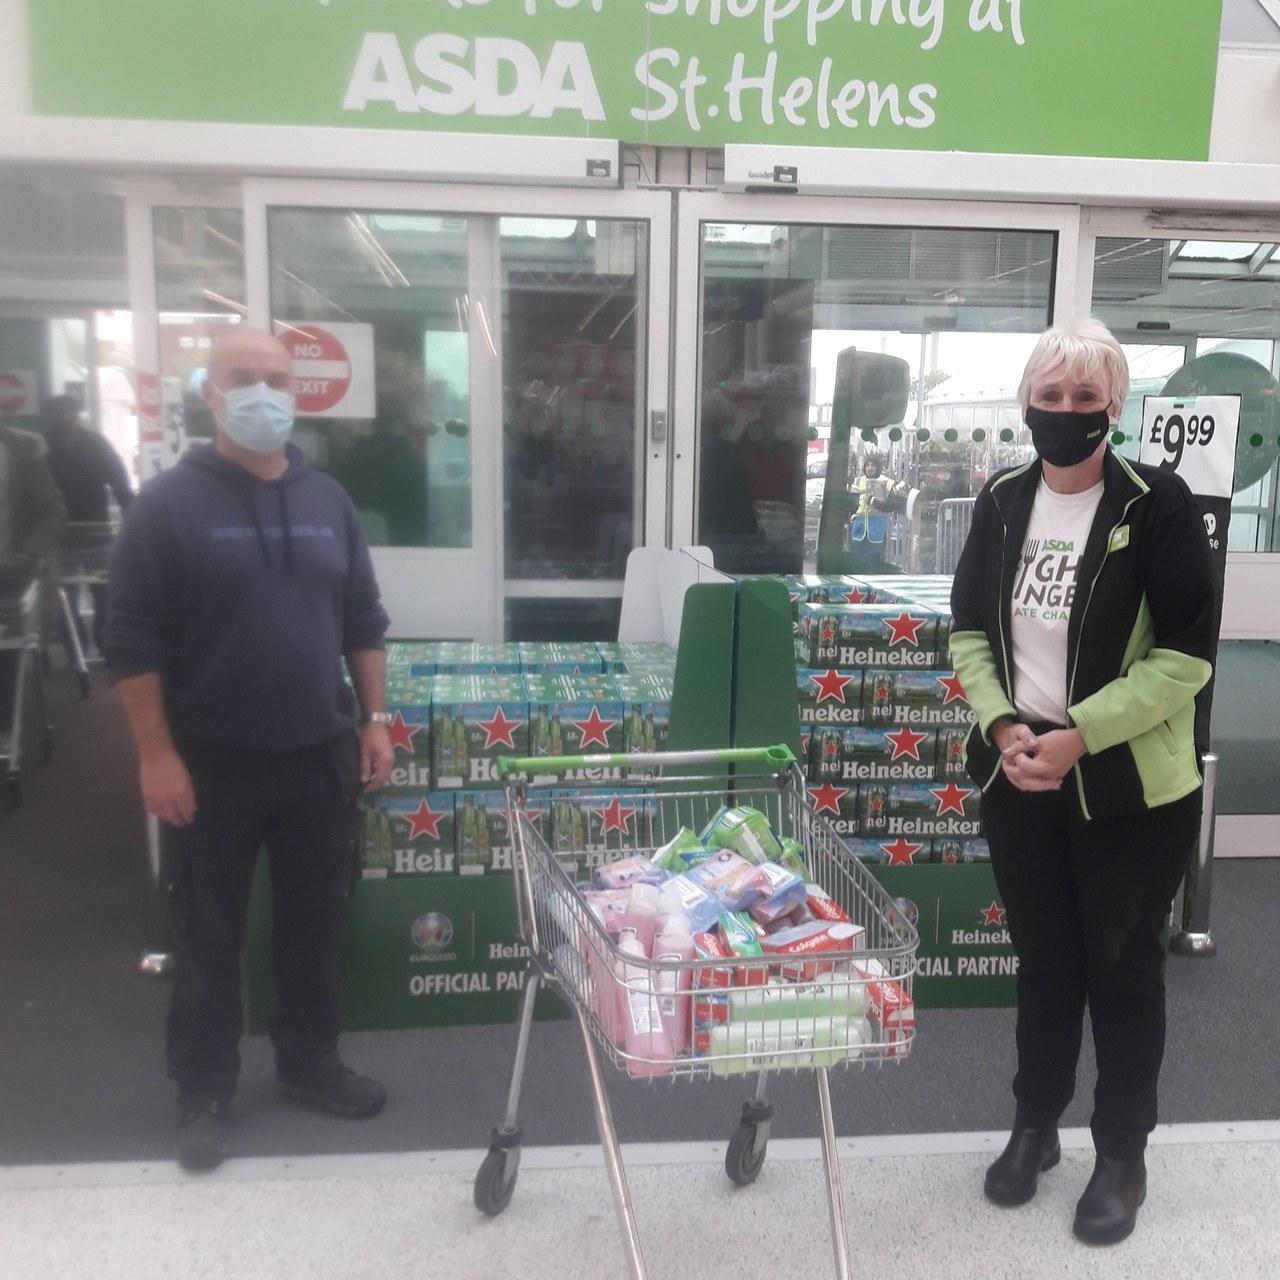 Asda St Helen's donates.......     Asda St Helens